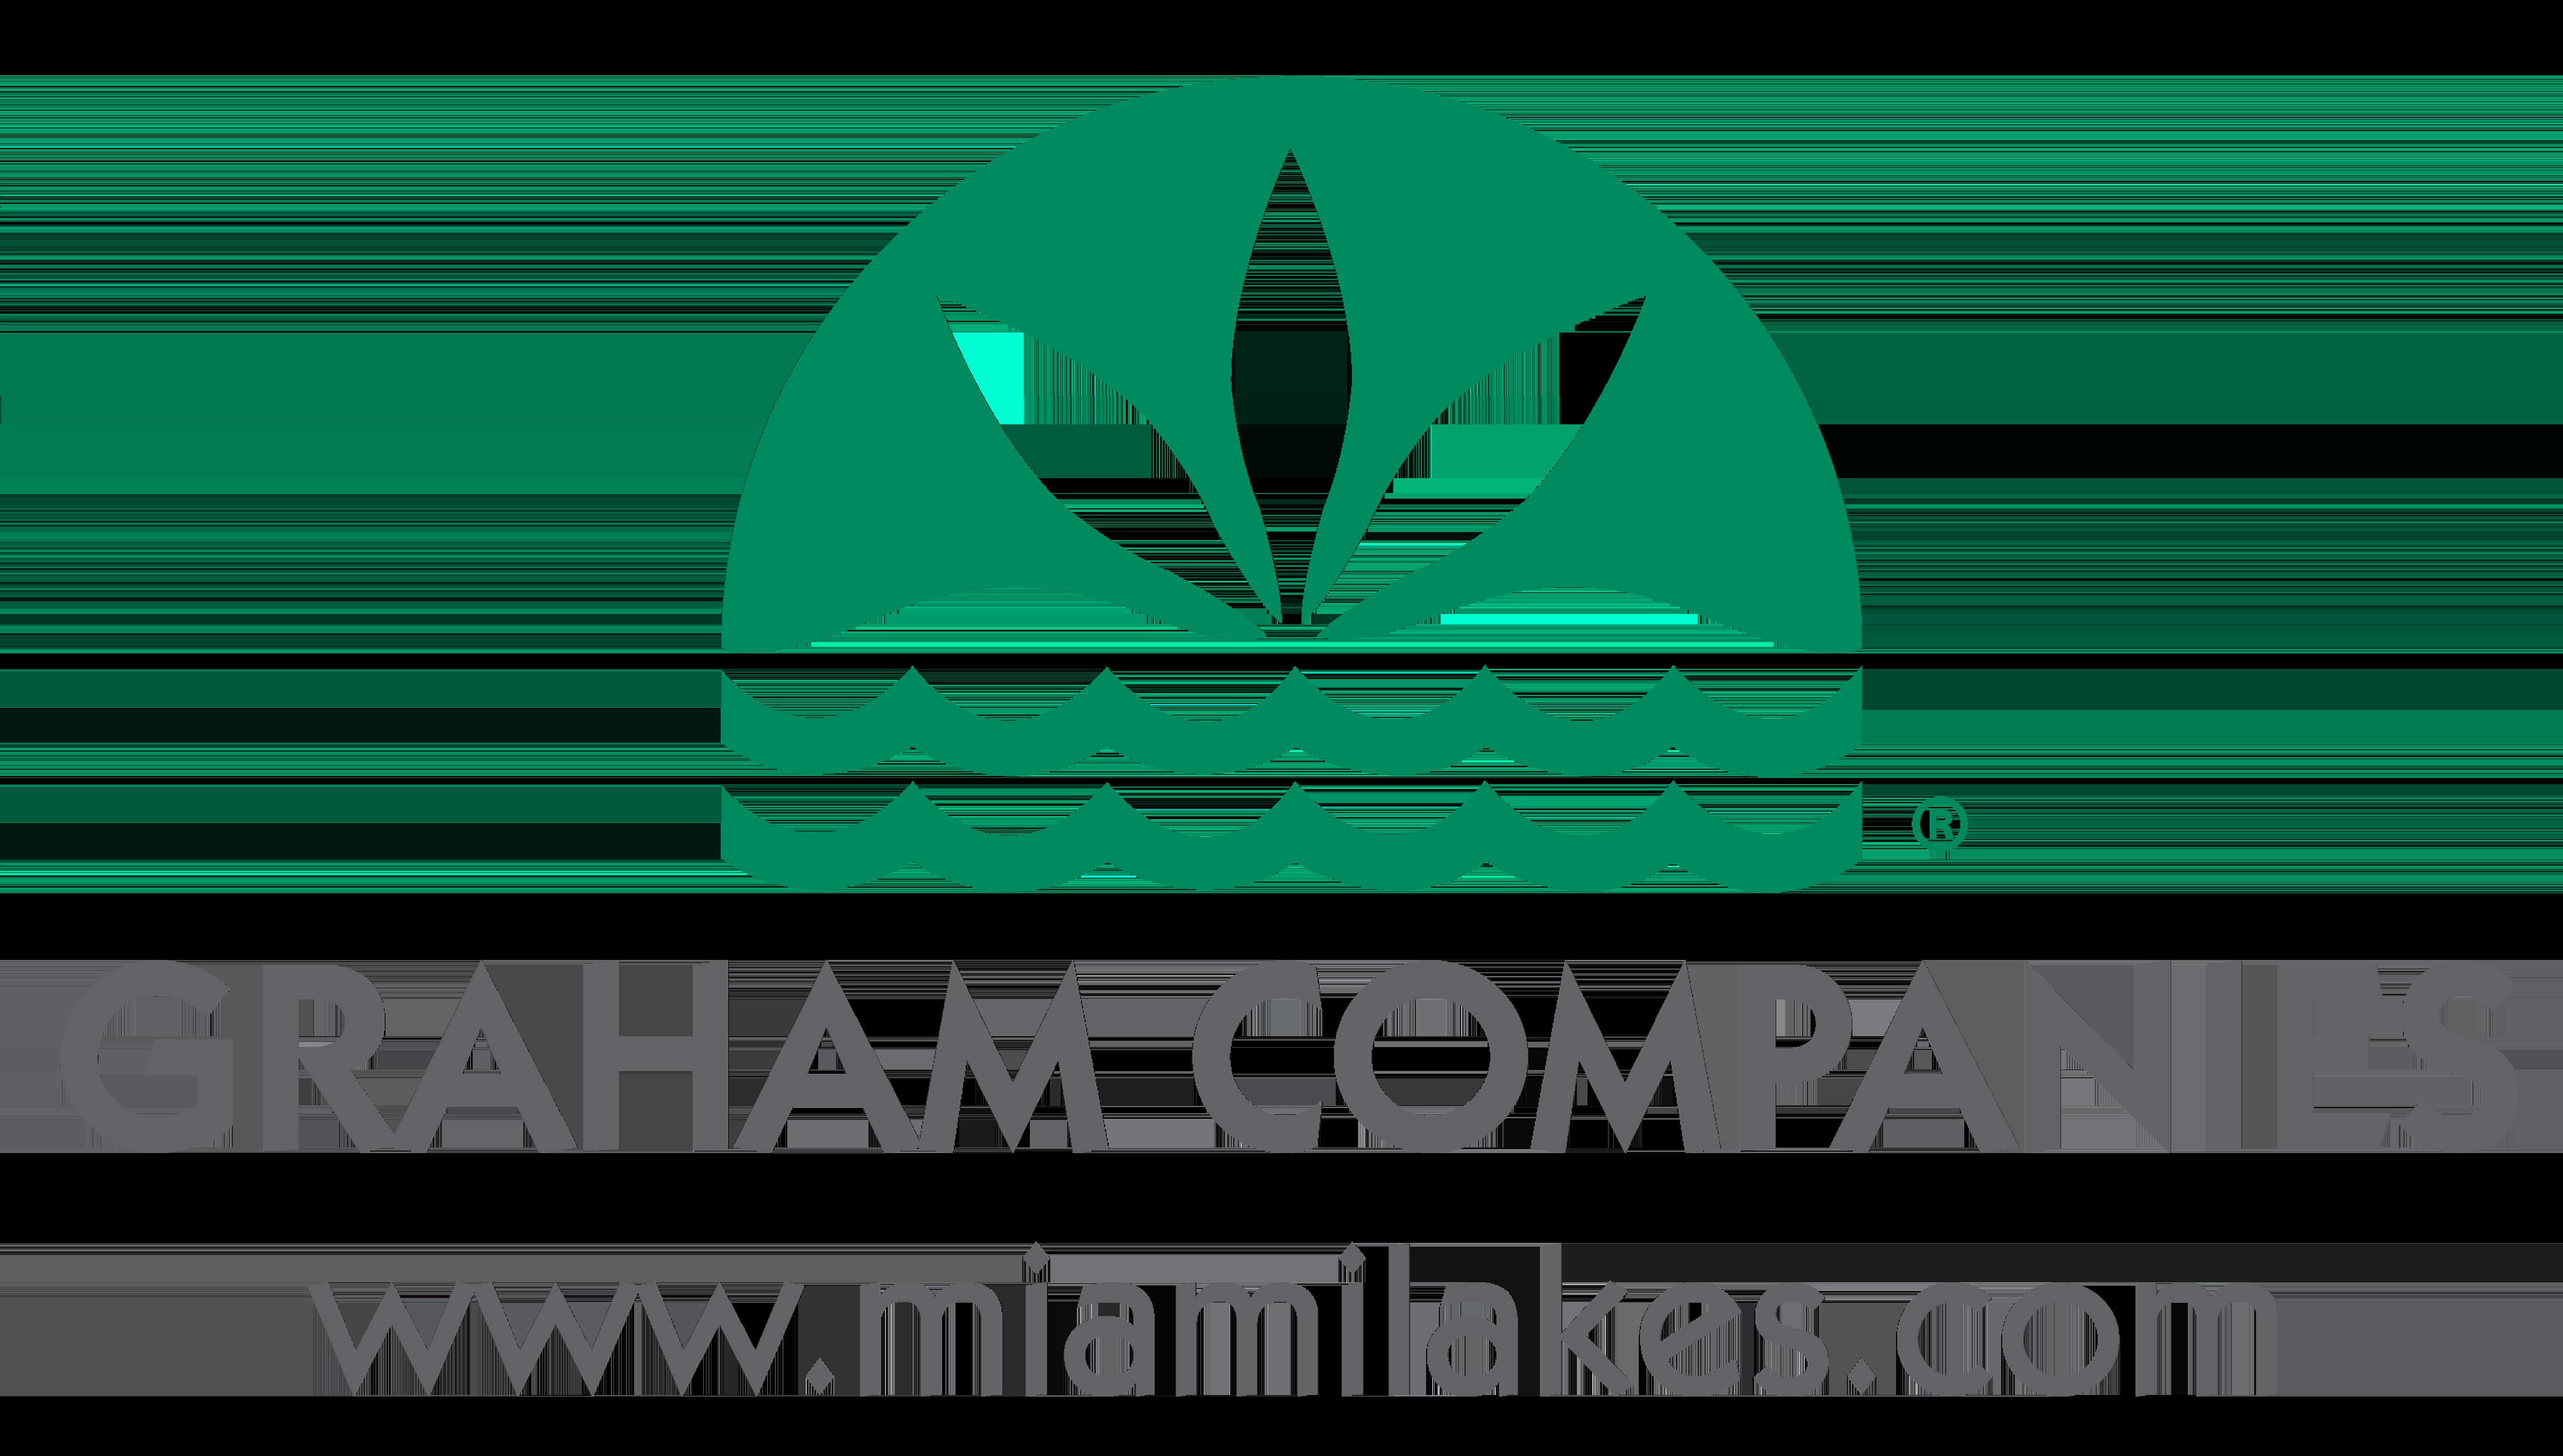 The Graham Companies